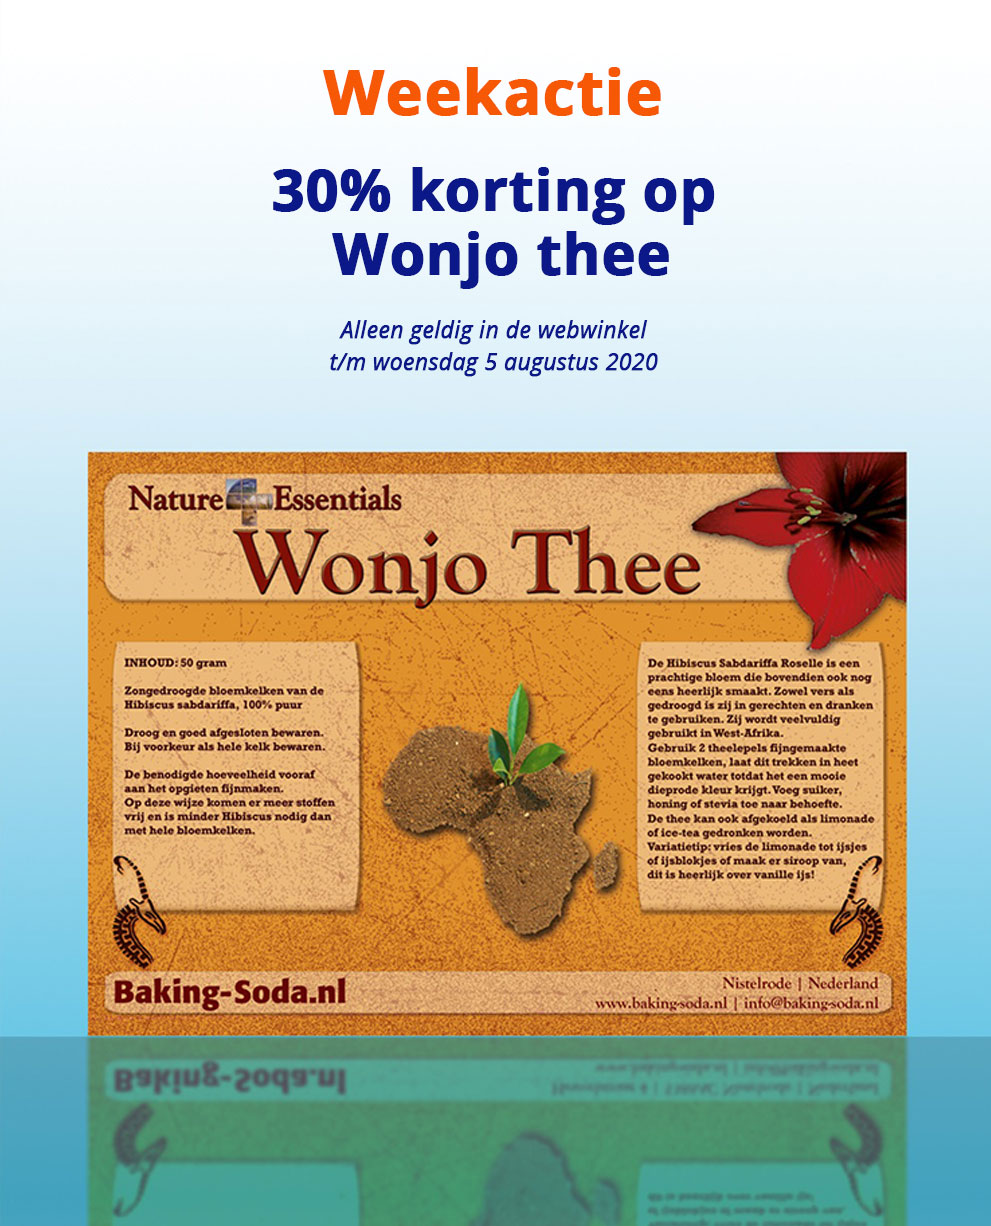 Weekactie-wonjothee-rood-augustus2020-bakingsoda-nl